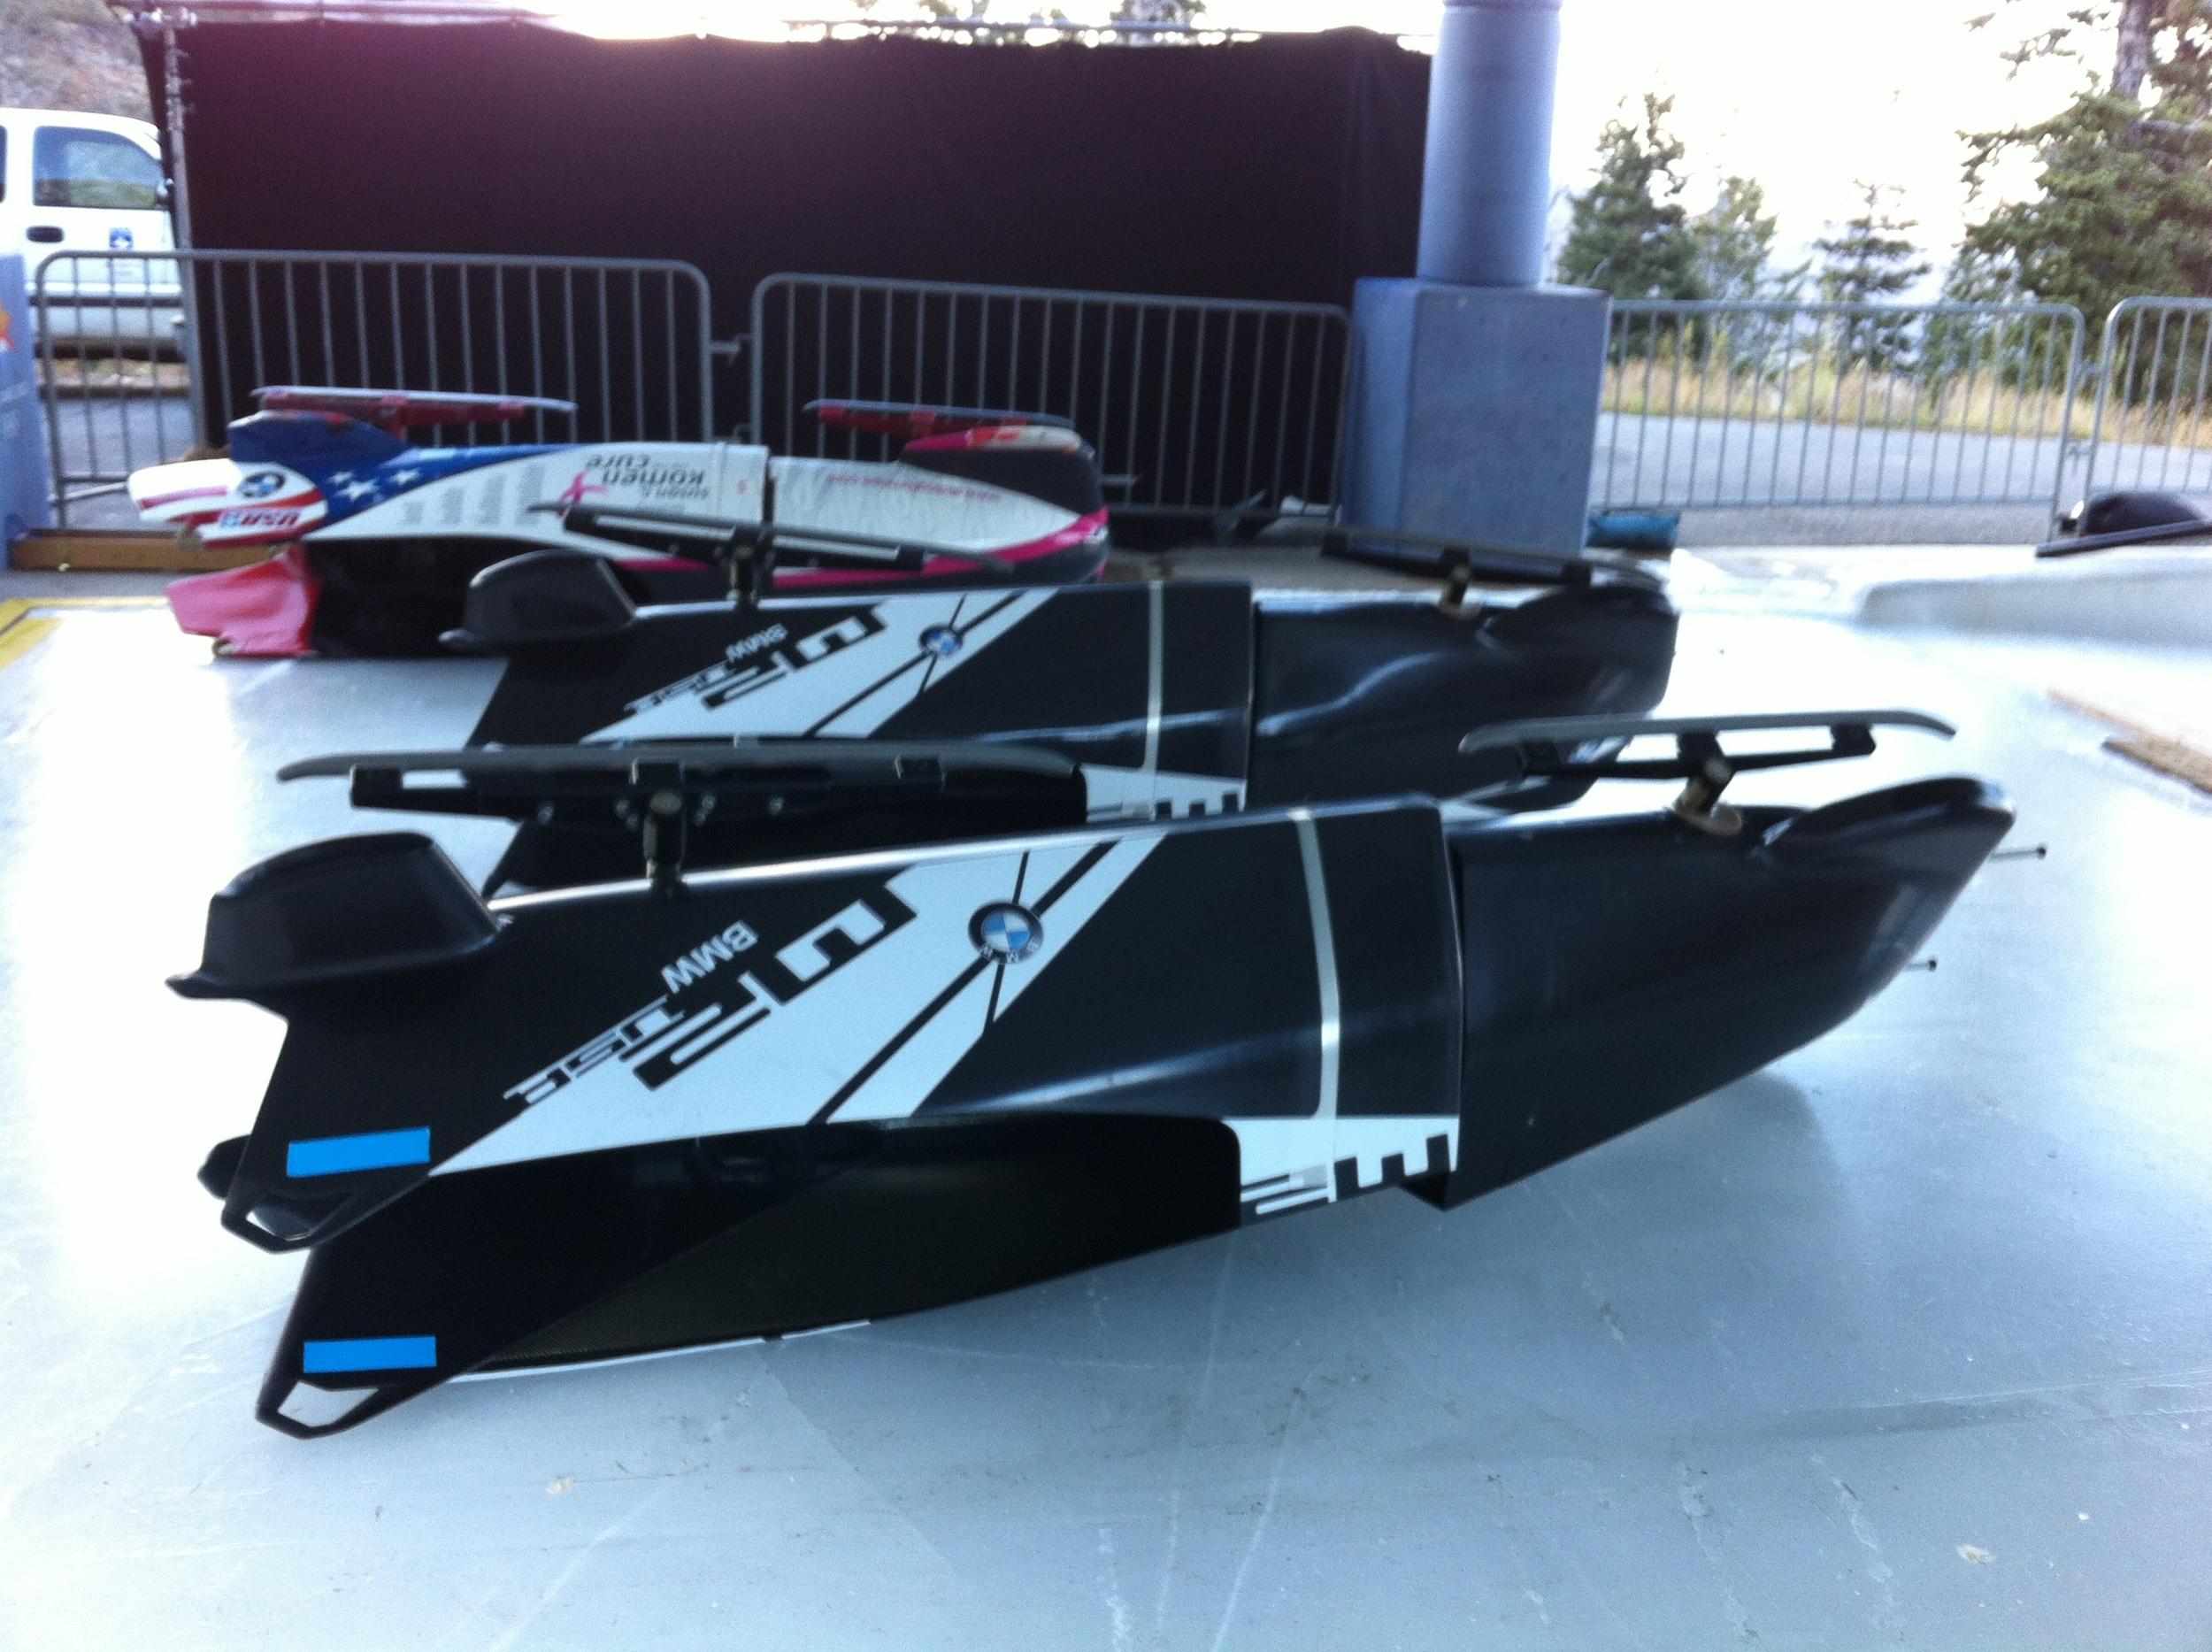 BMW 2-man bobsleds - built by BMW USA DesignWorks